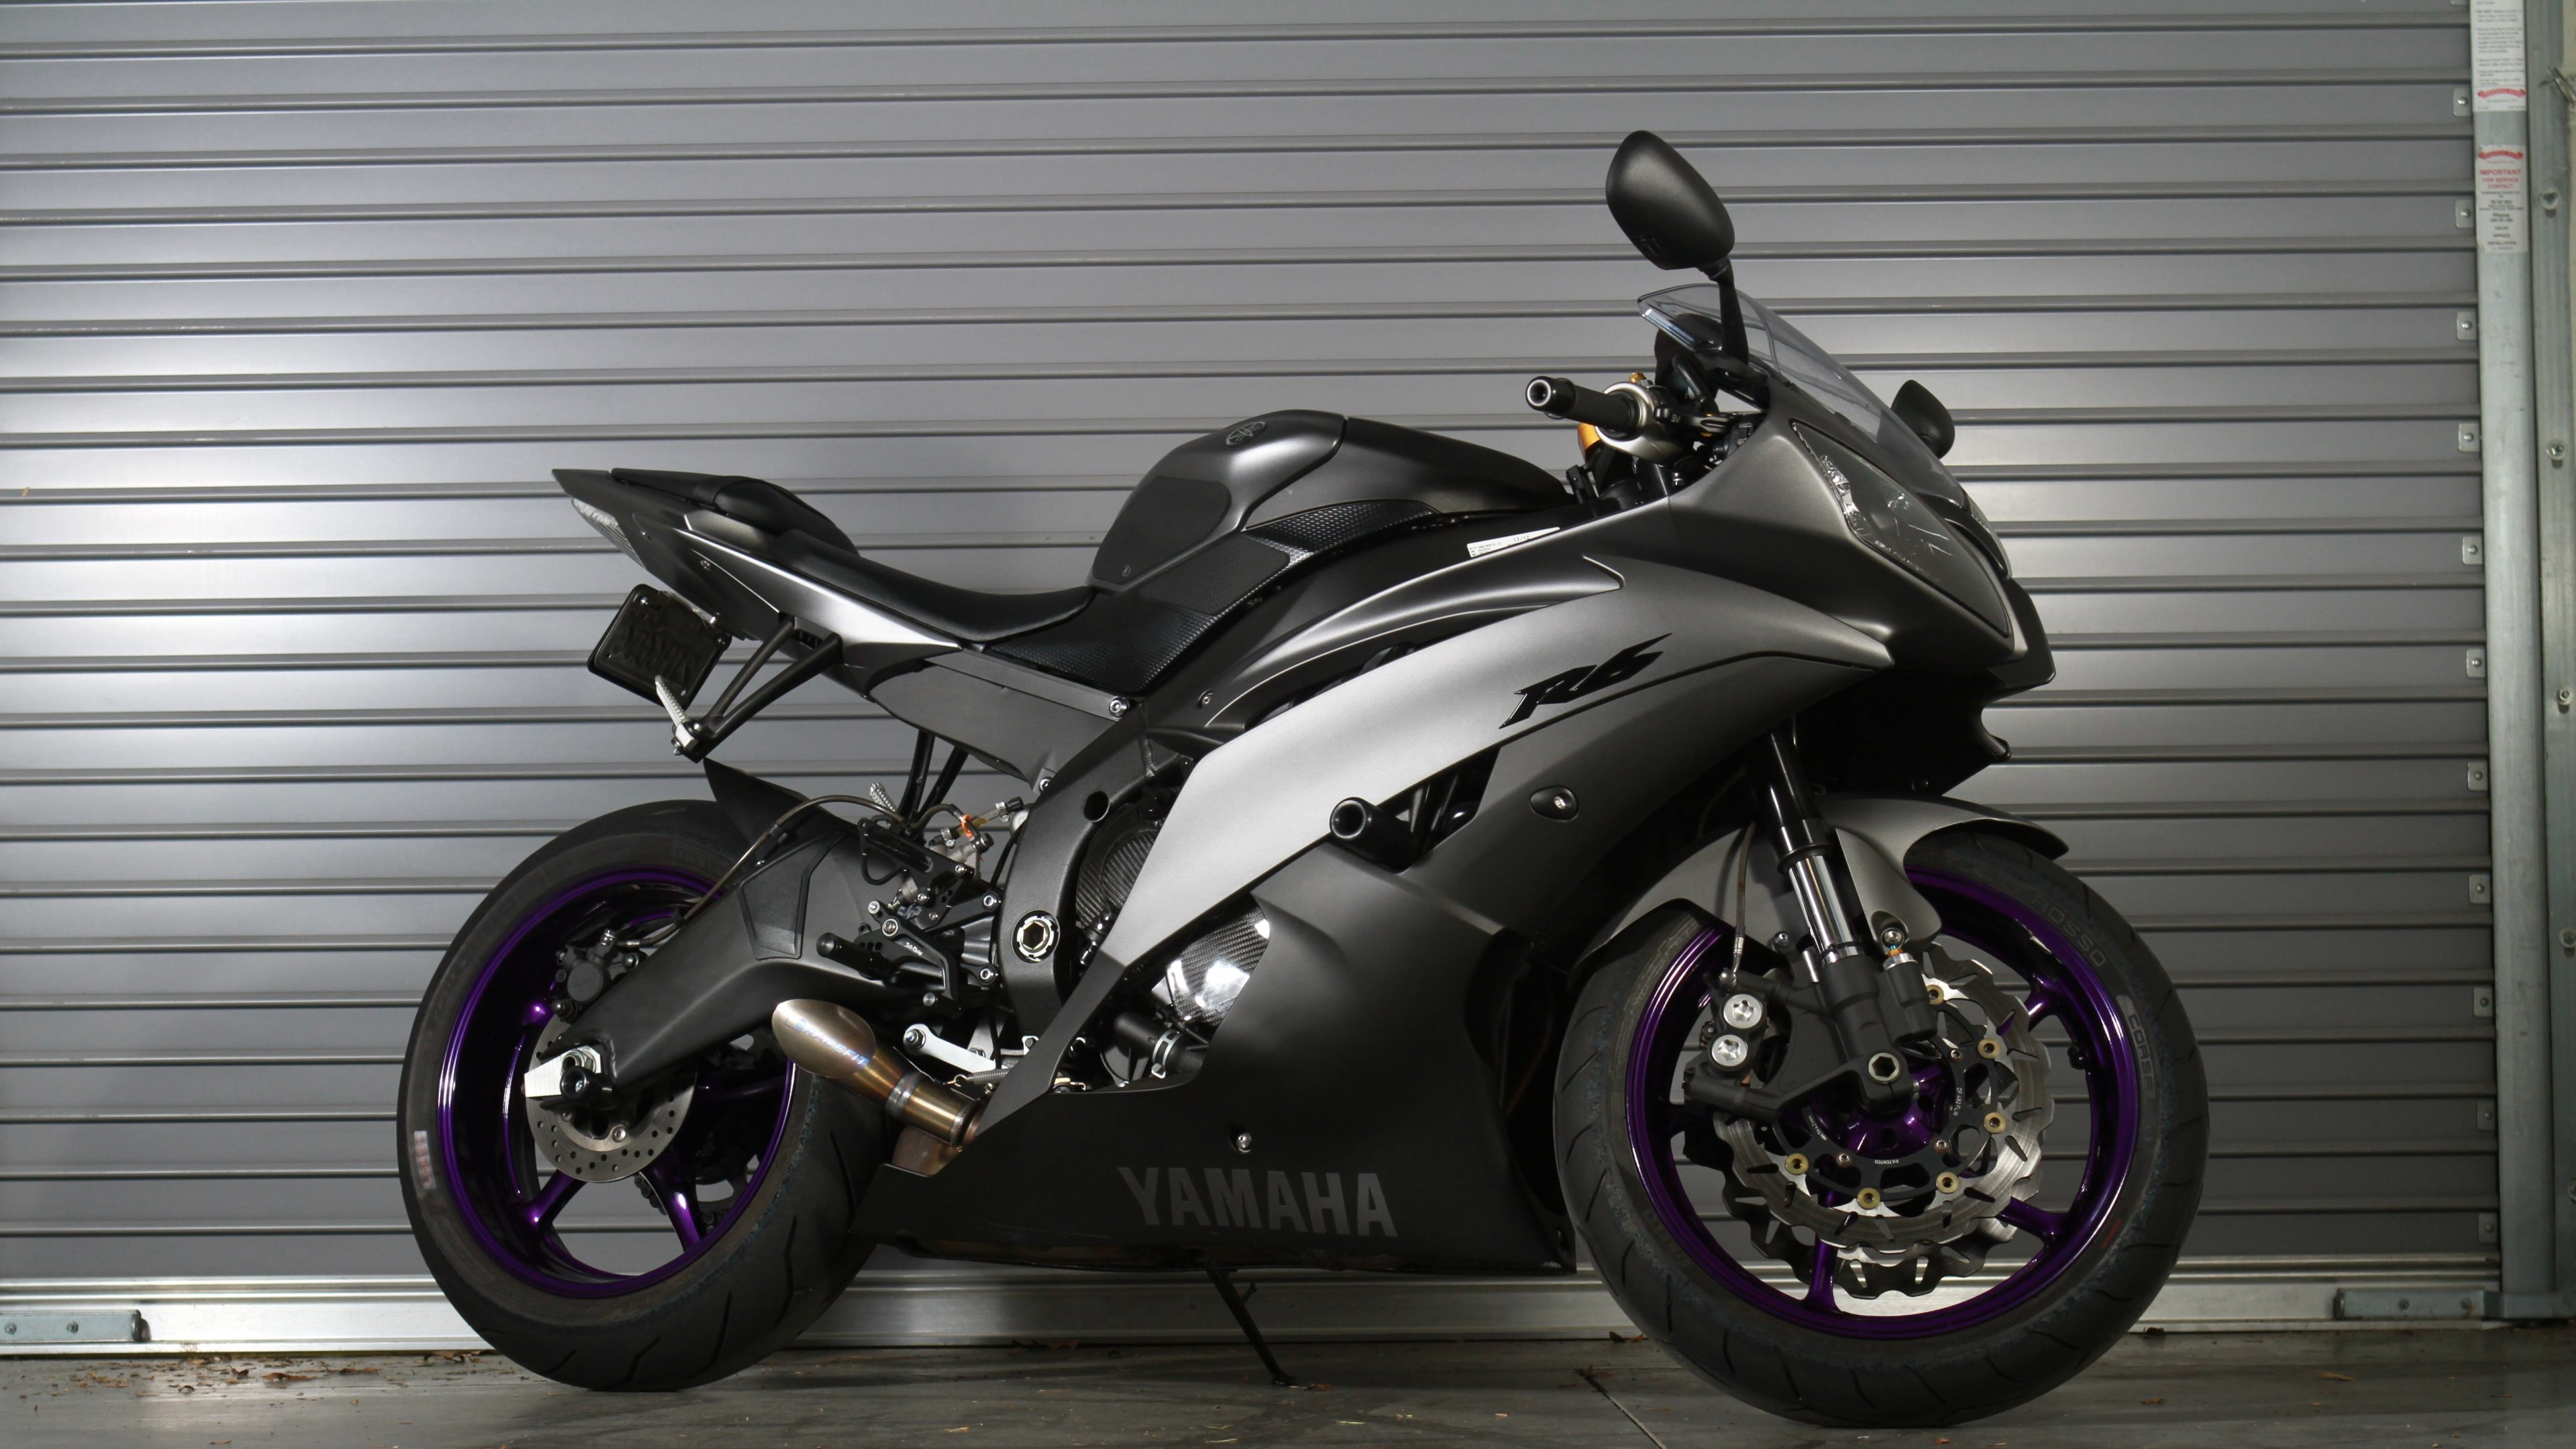 Motorcycles wallpaper desktop 52 images - Superbike wallpaper ...